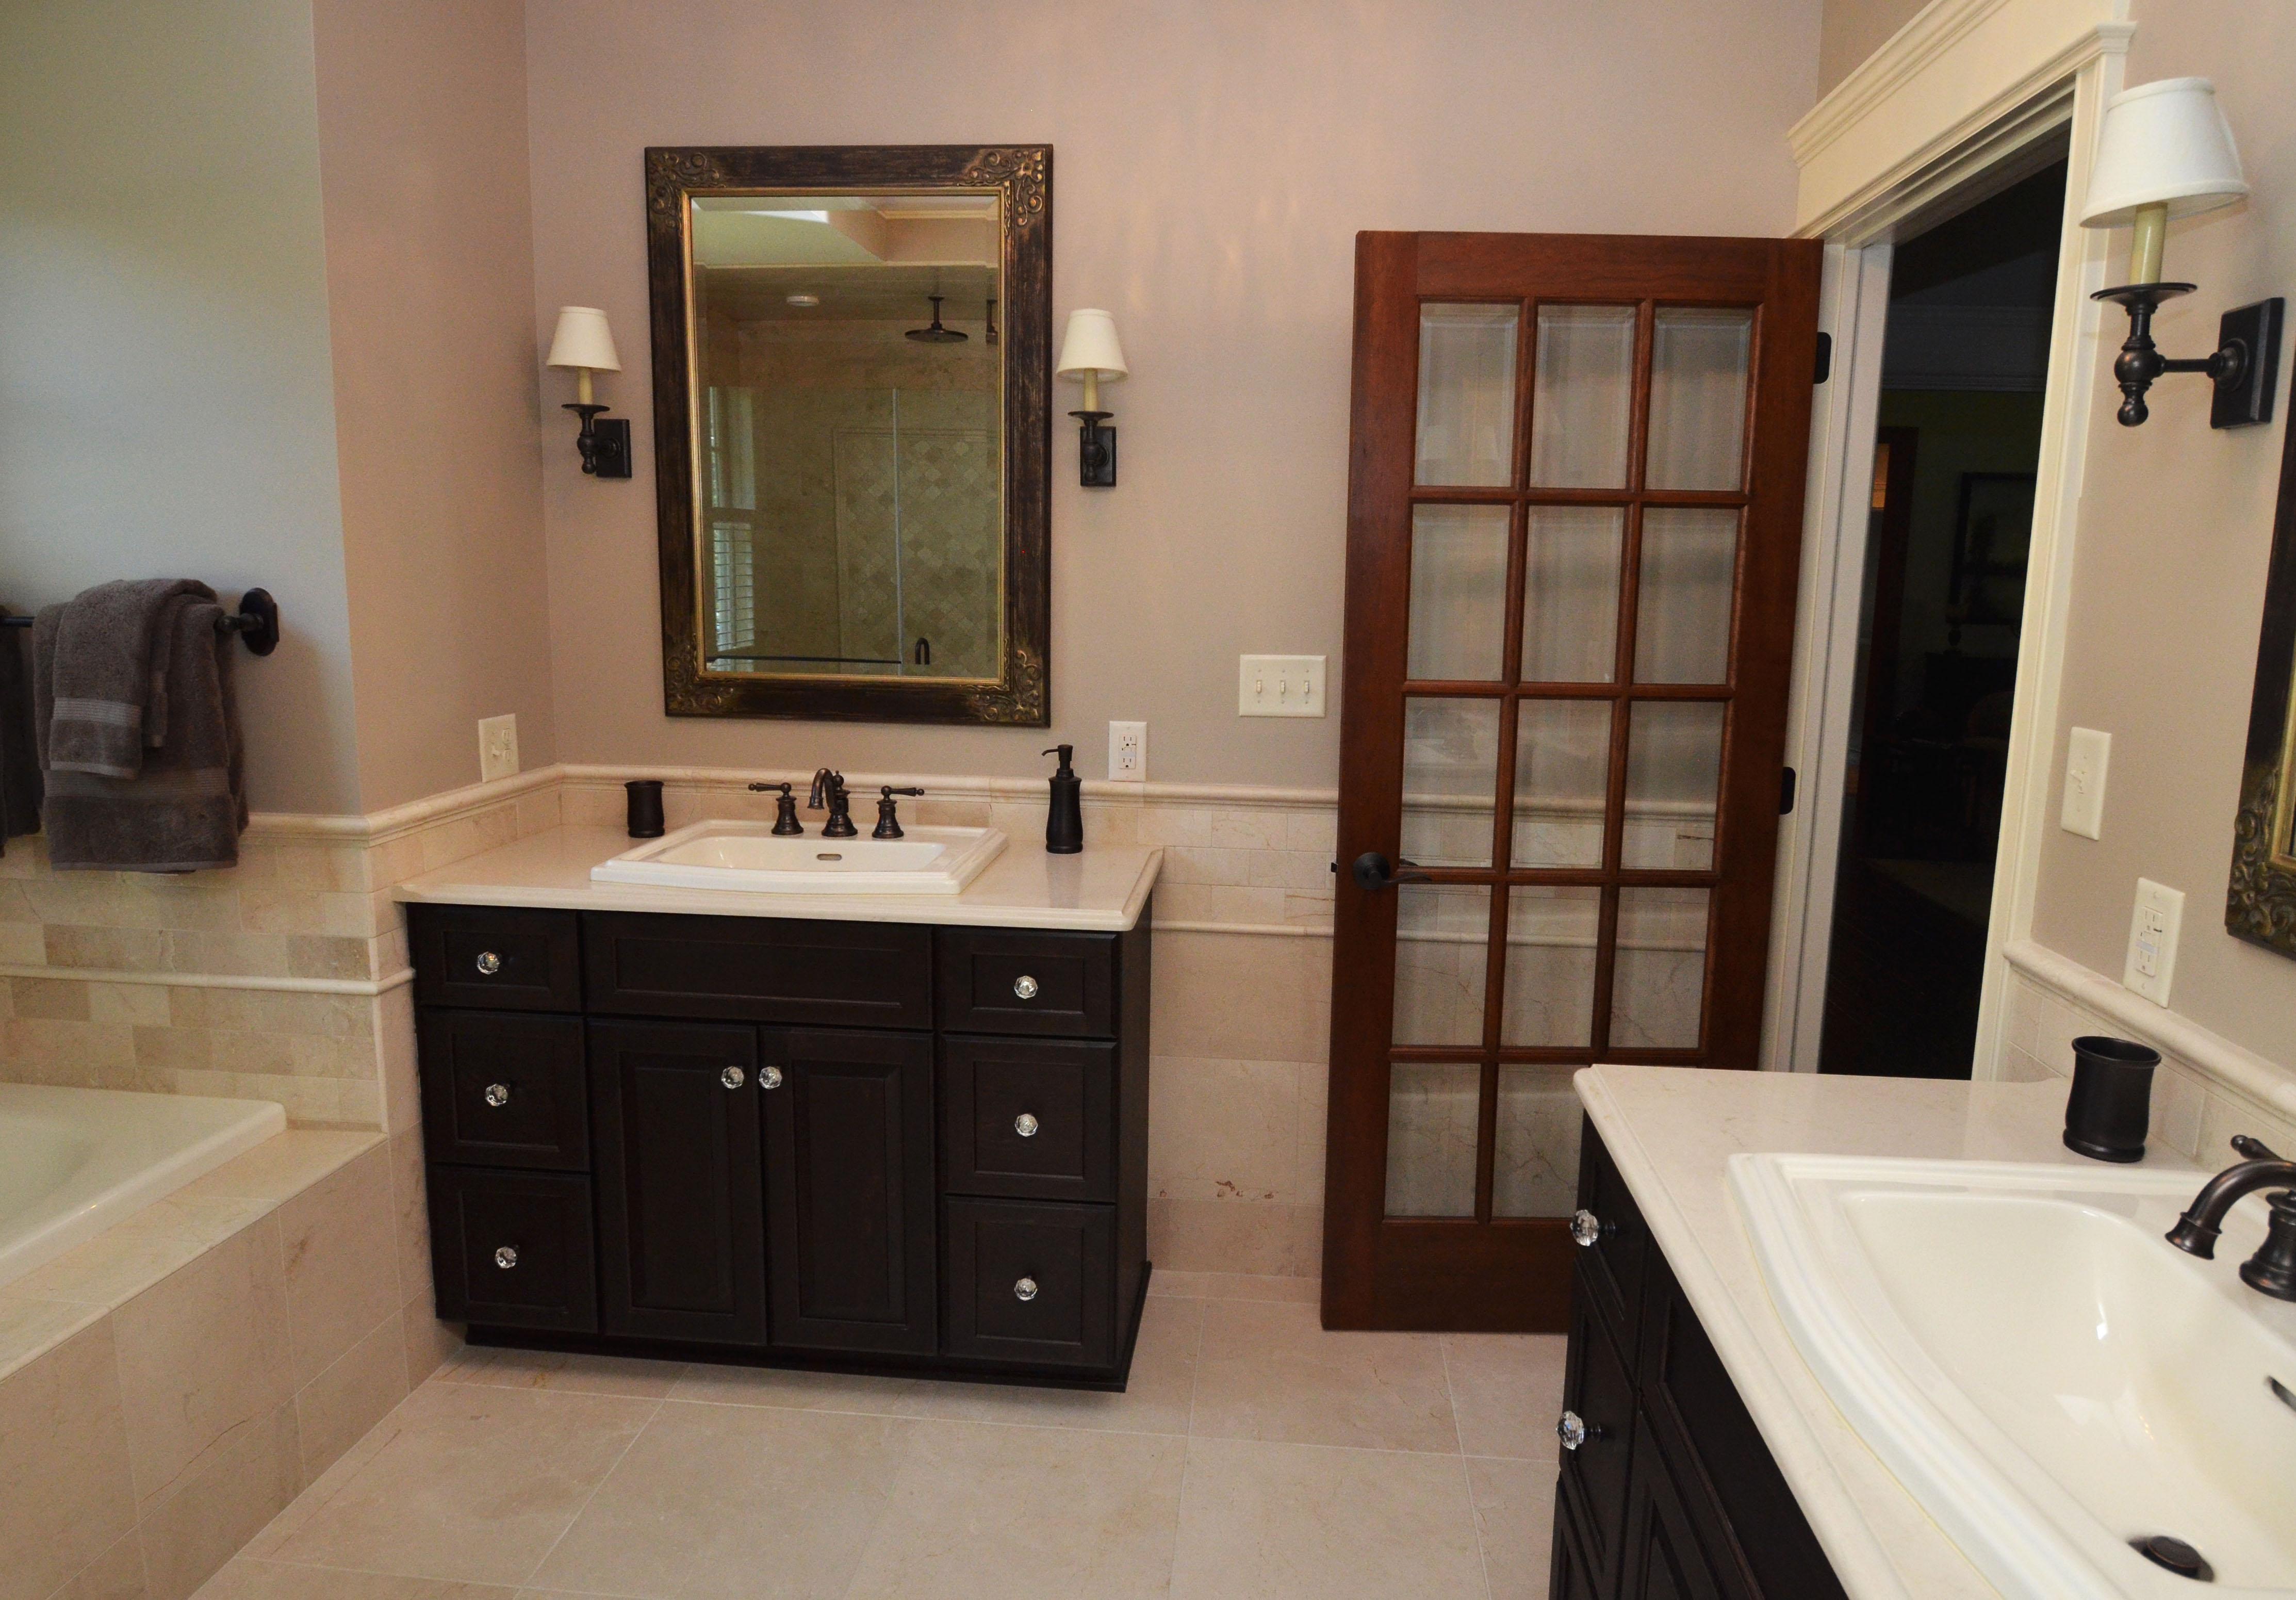 Wholesale Bathroom Vanity Commercial Bathroom Vanity Lighting Fixtures For Bathroom Vanity